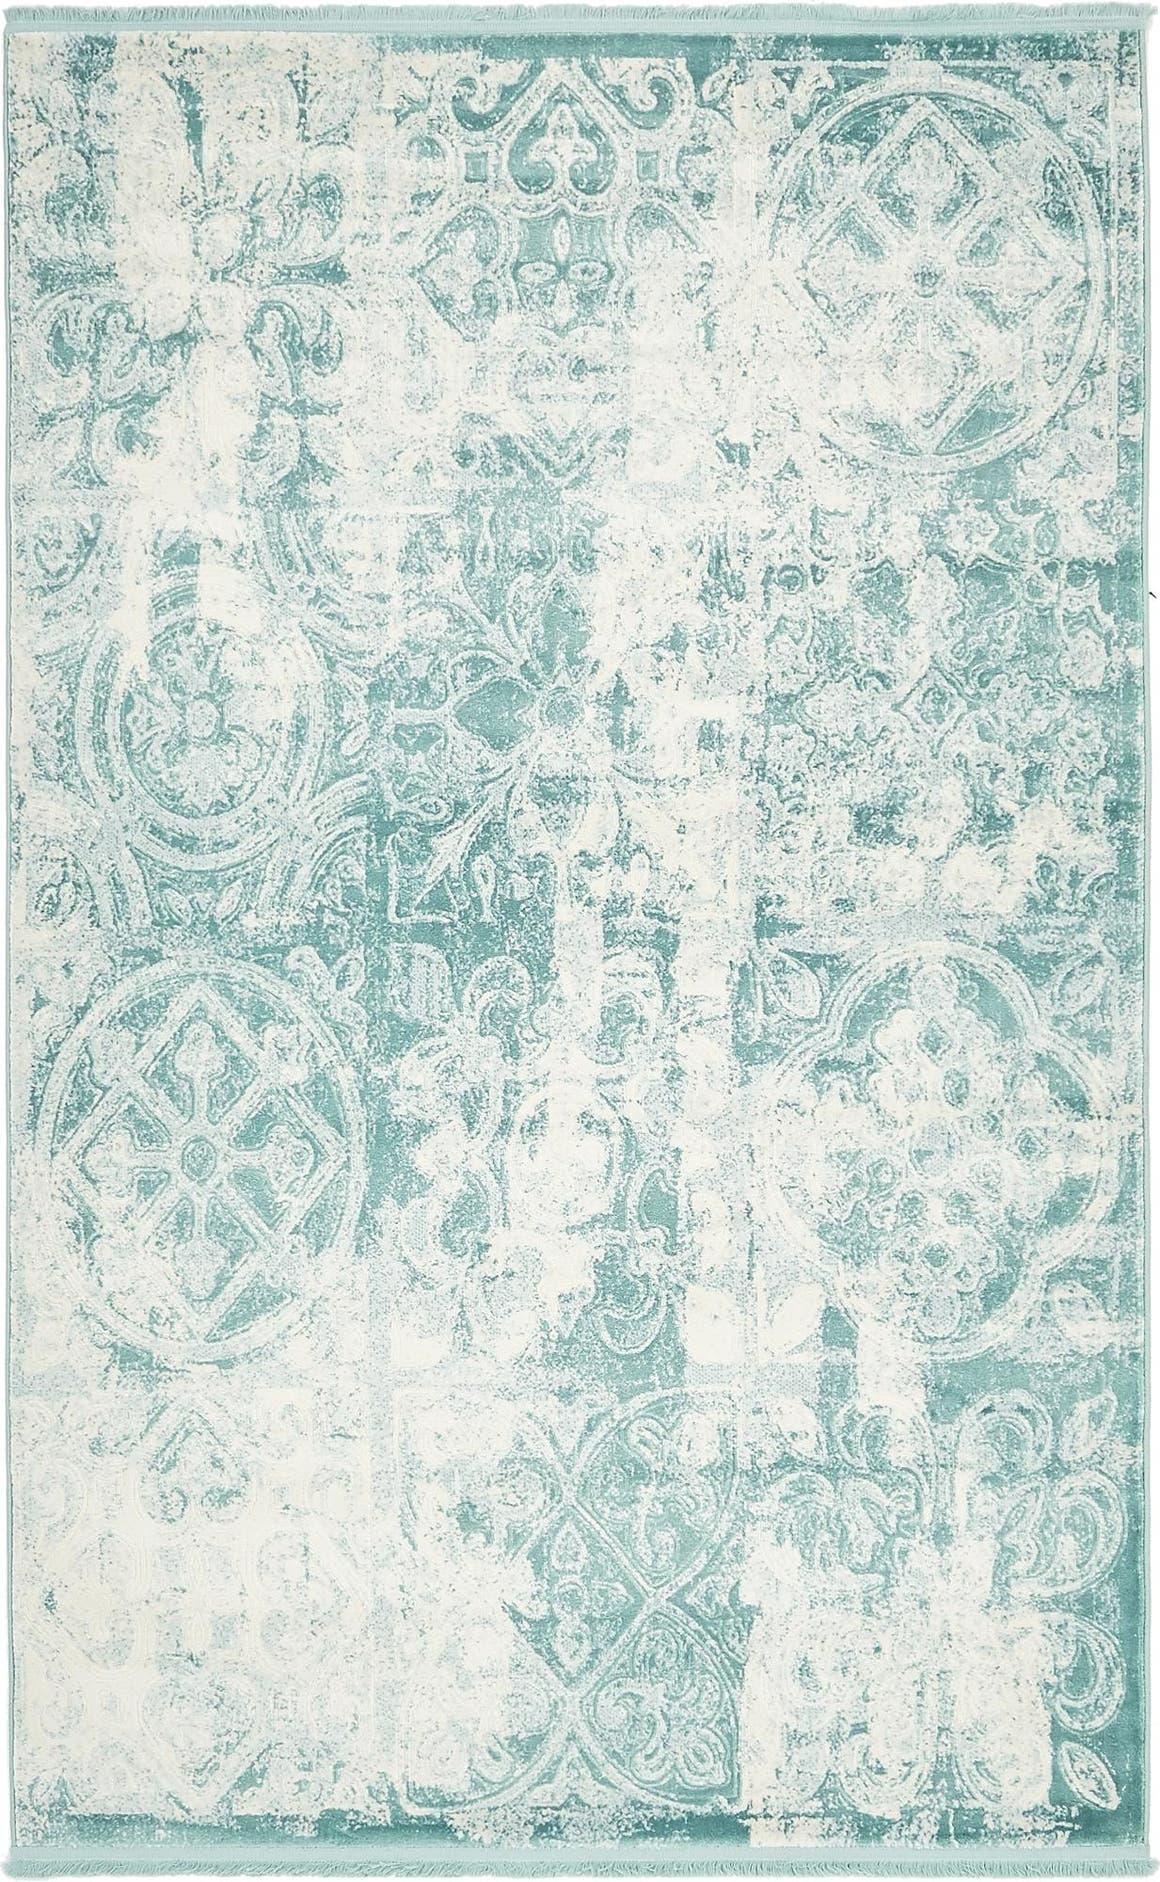 5' x 8' New Vintage Rug main image